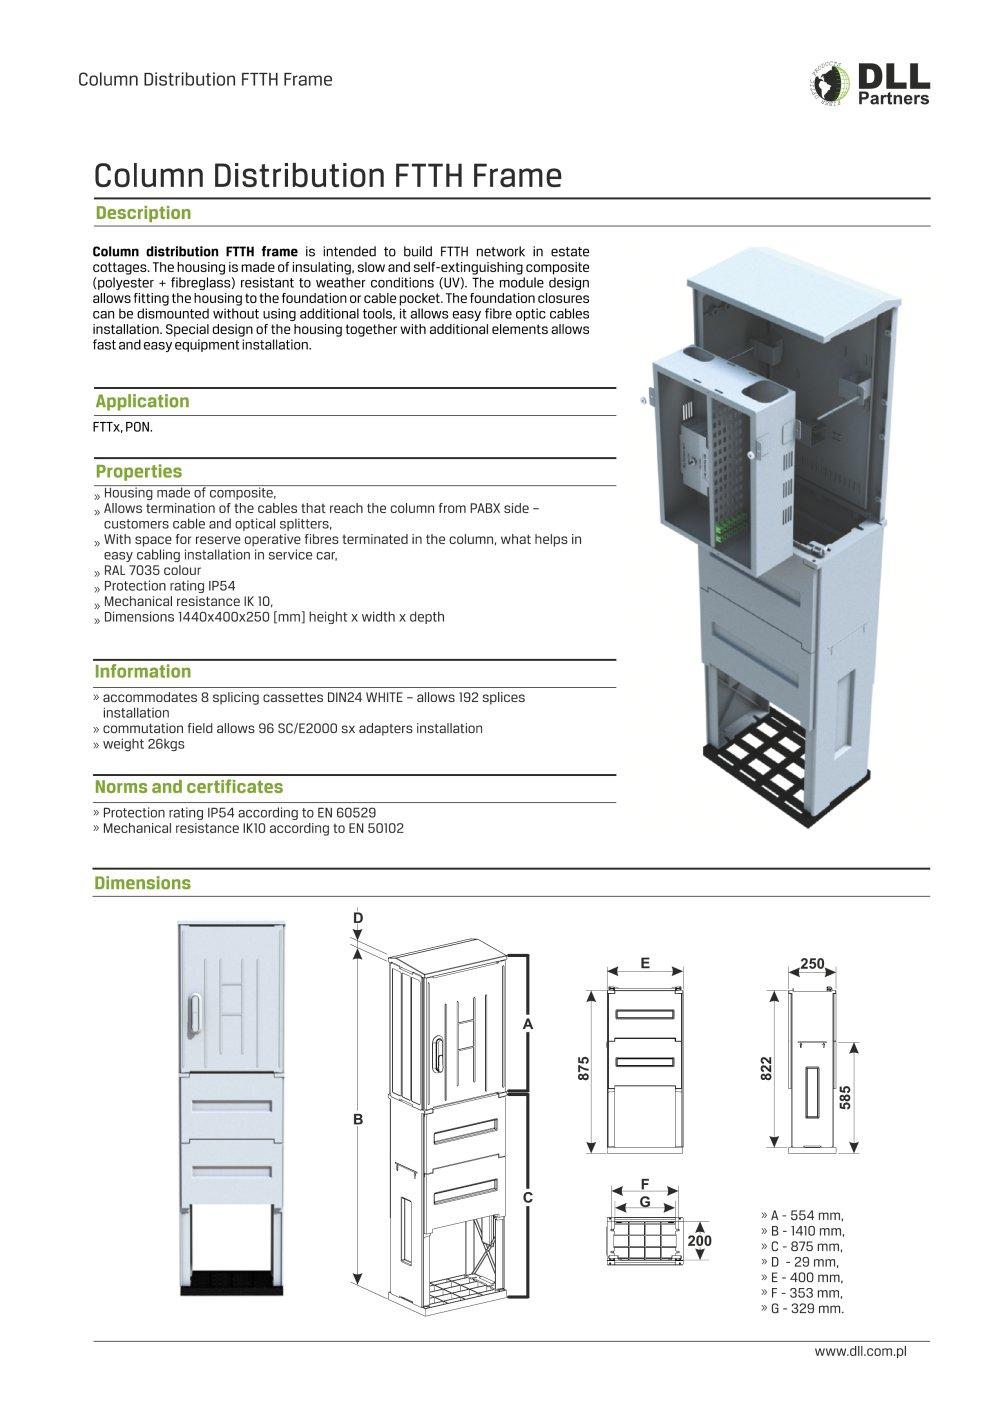 Column Distribution FTTH Frame - DLL Partners - PDF Catalogue ...